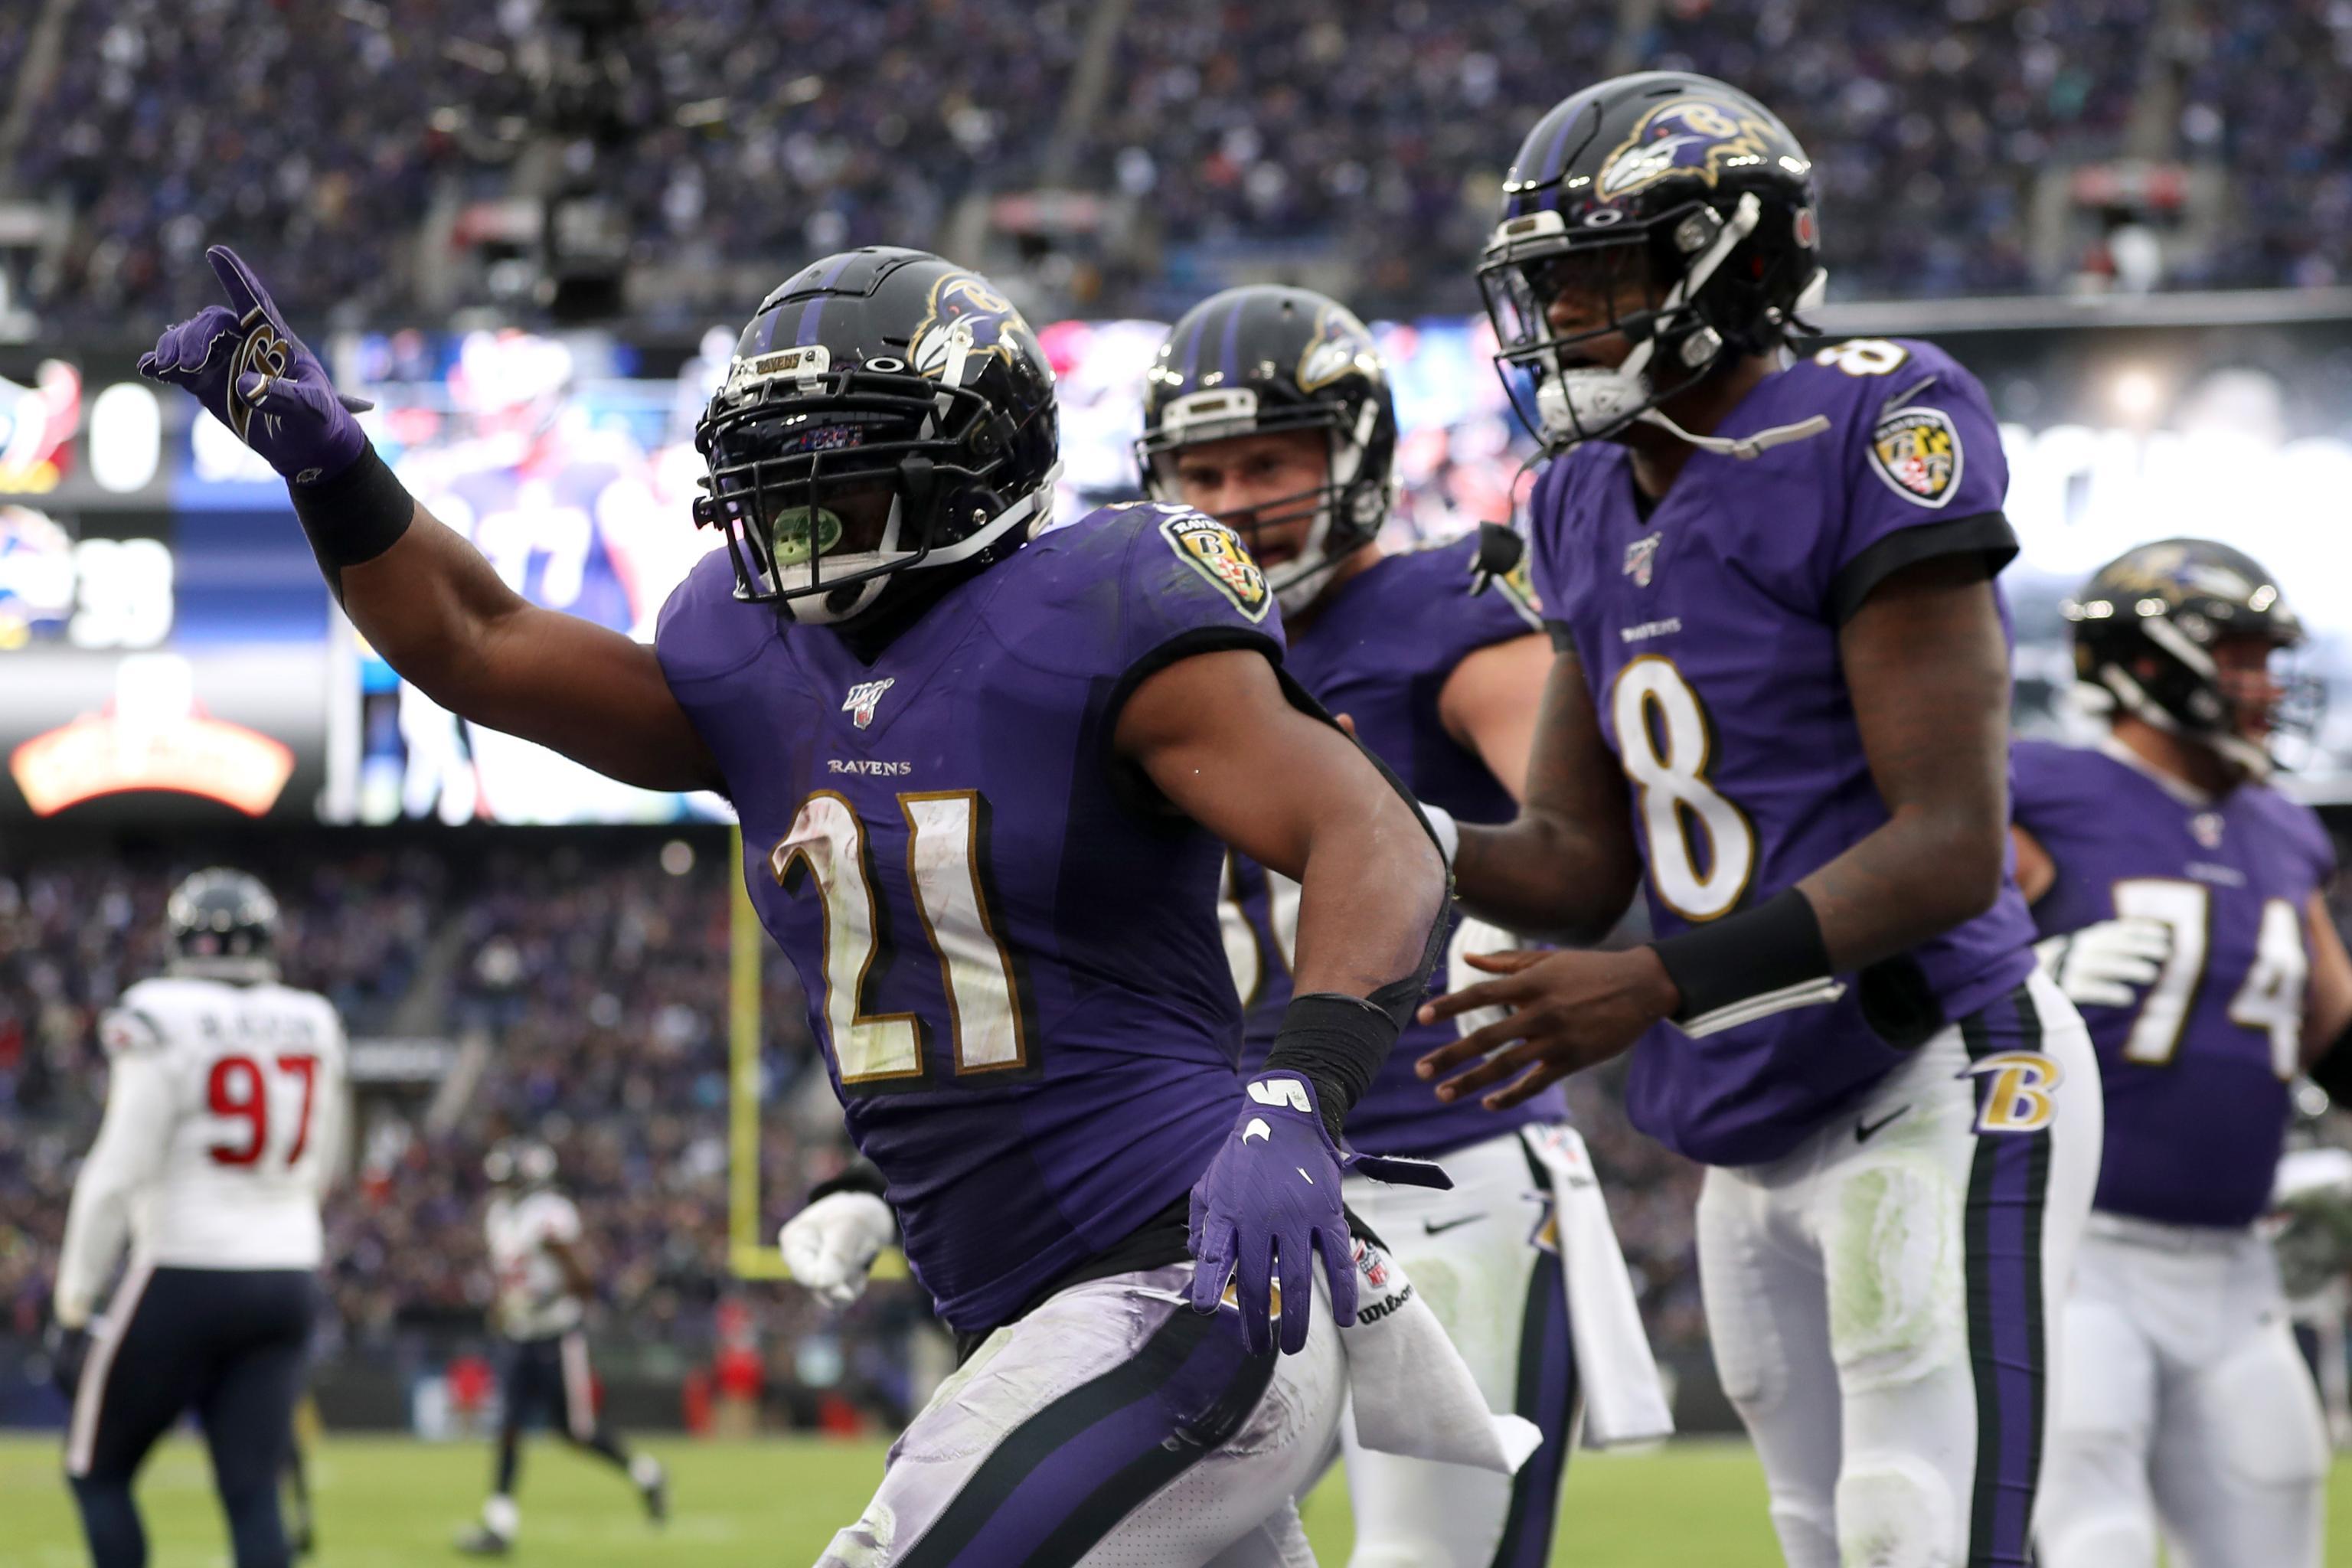 Ravens Mark Ingram Lamar Jackson Leads MVP Race Says Critics 3072x2048